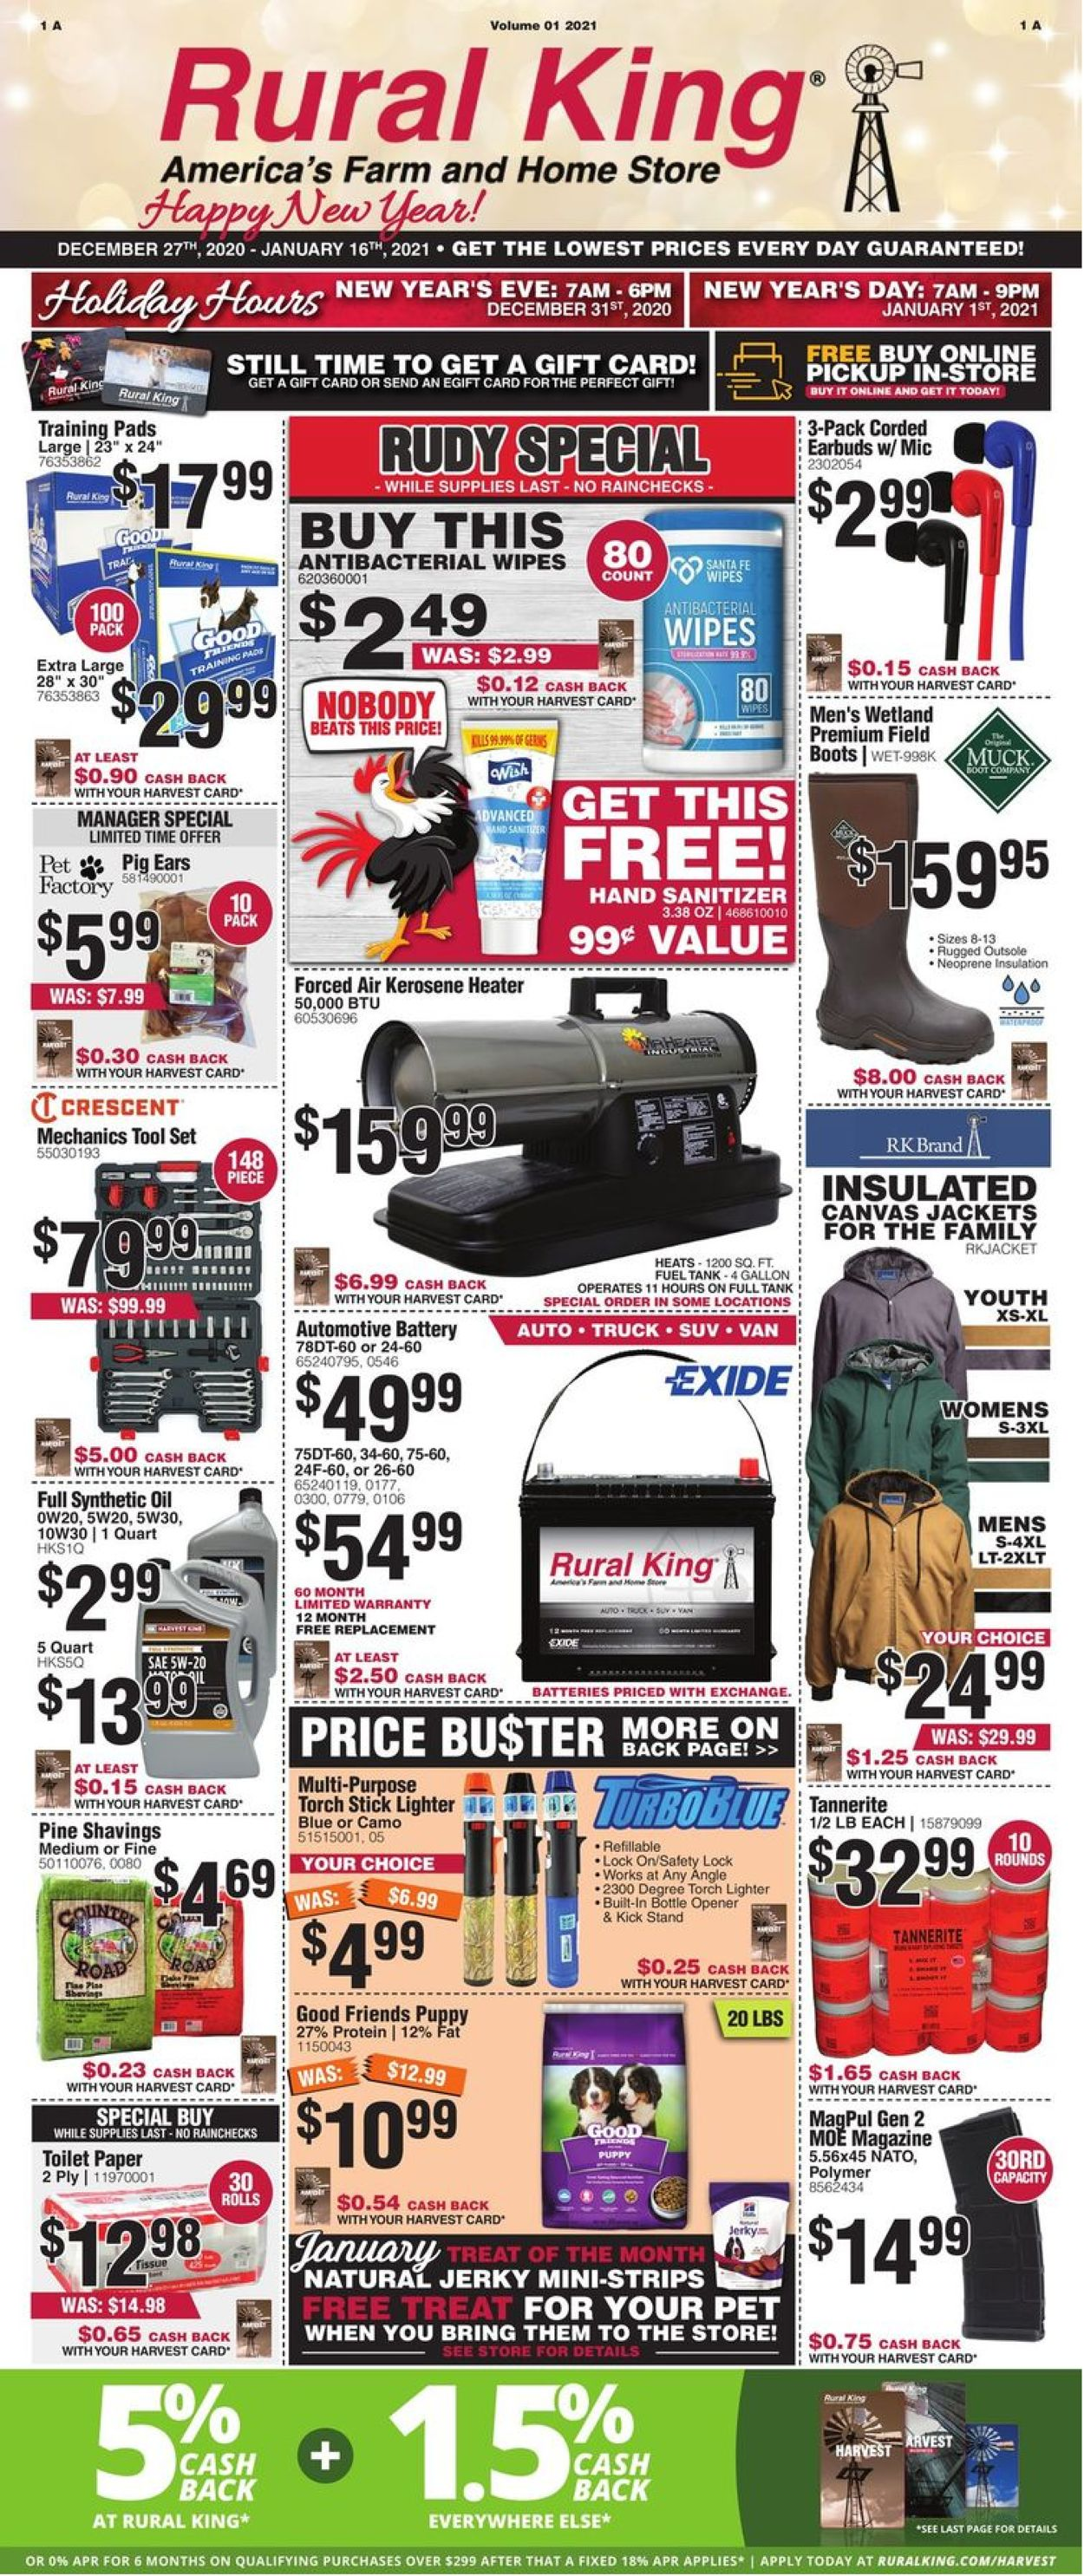 Rural King Weekly Ad Circular - valid 12/27-01/16/2021